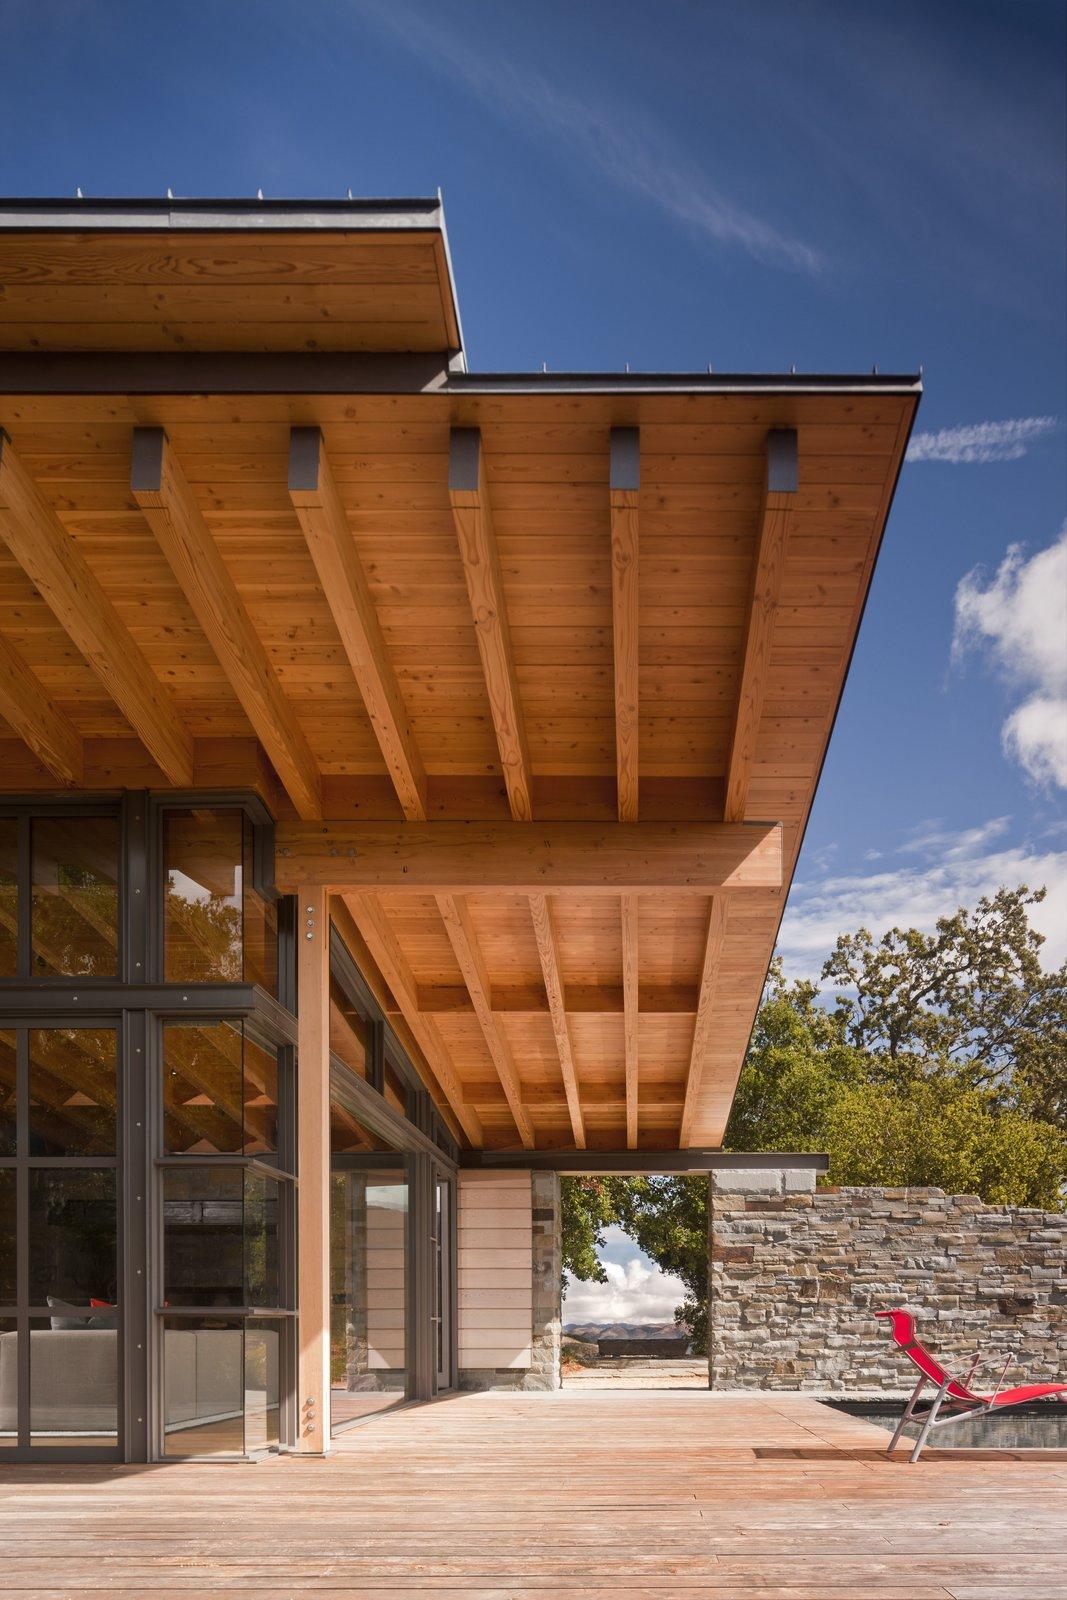 Outdoor, Large Patio, Porch, Deck, Wood Patio, Porch, Deck, and Stone Fences, Wall  Halls Ridge Knoll by Bohlin Cywinski Jackson